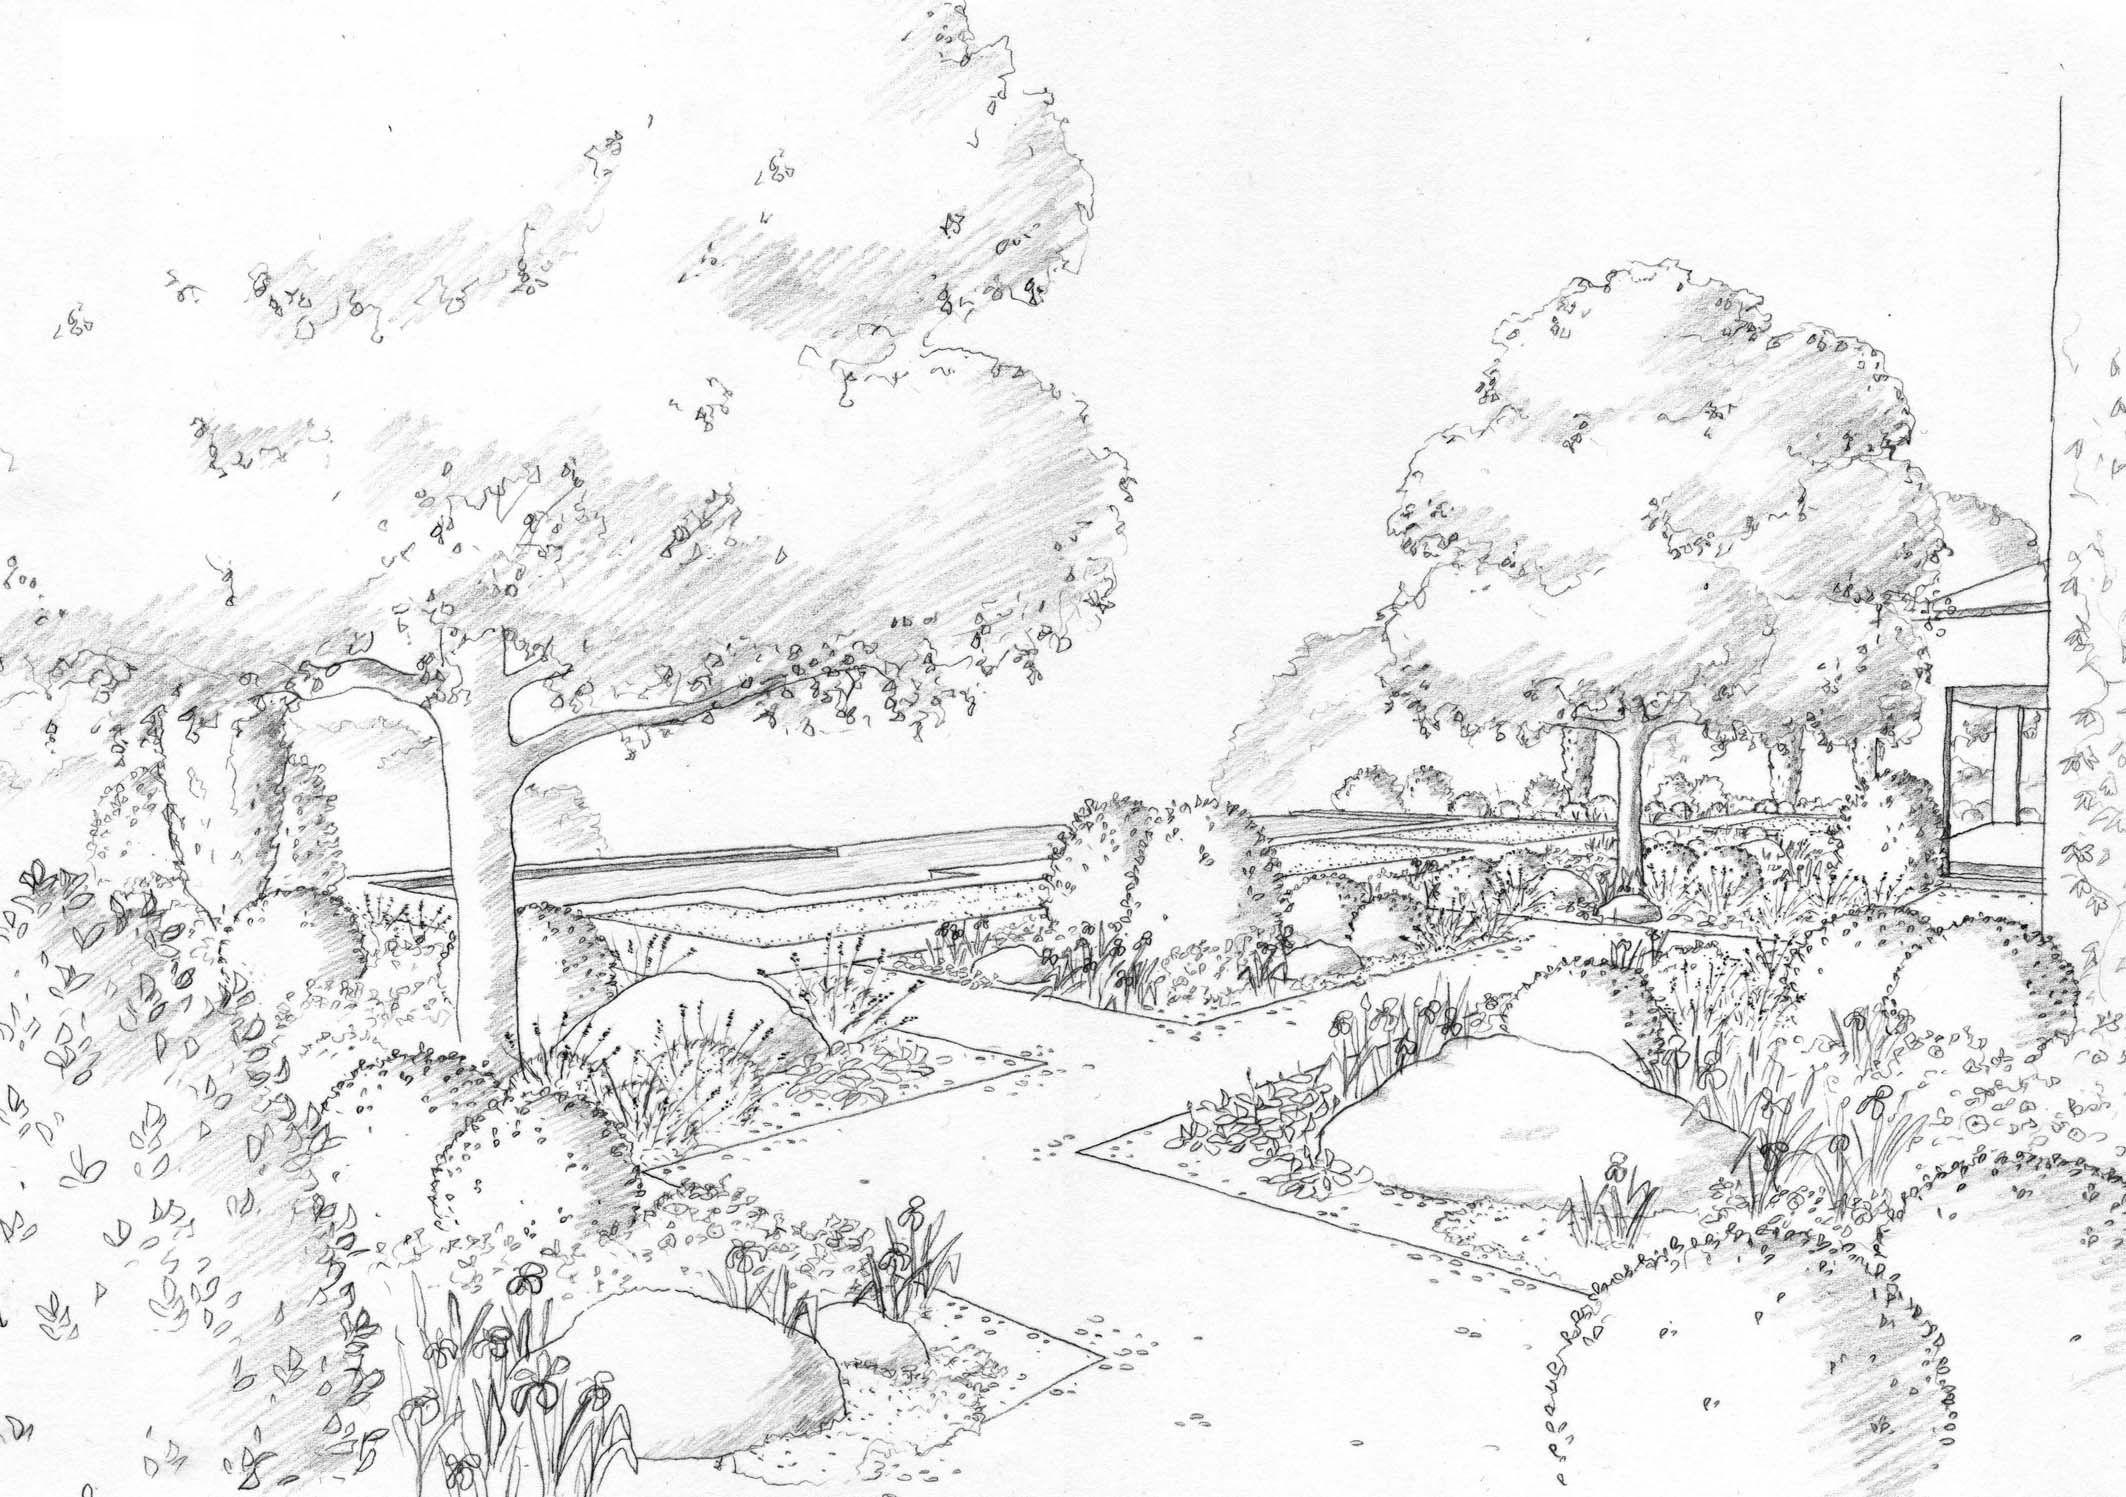 landscape drawings la visualisations landscape drawings coloring pages nature draw. Black Bedroom Furniture Sets. Home Design Ideas